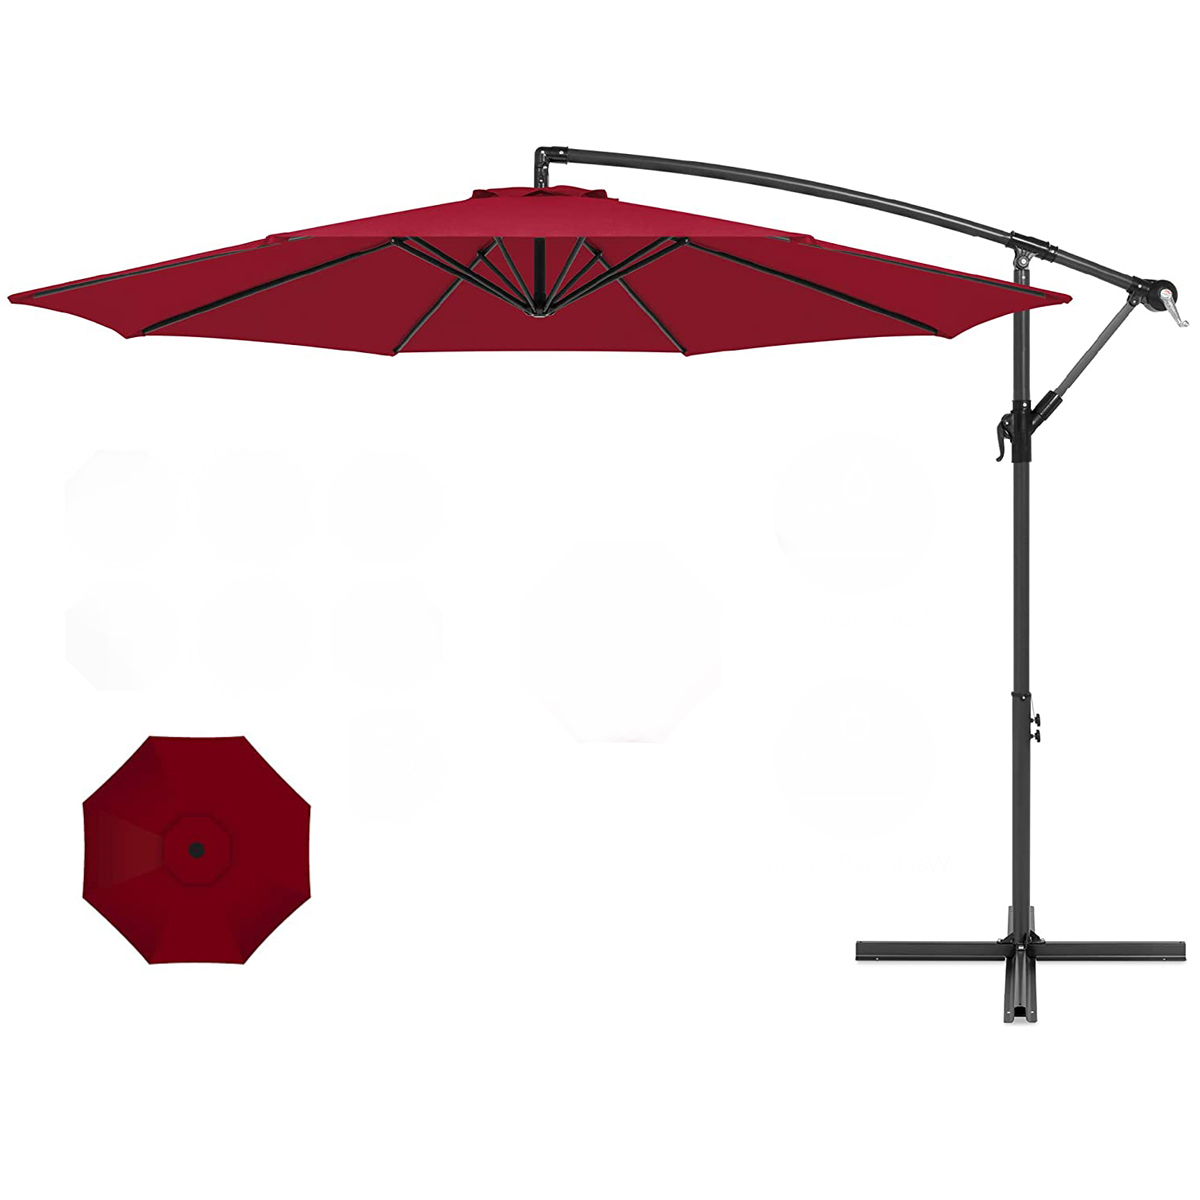 xtremepowerus 10 ft offset cantilever patio umbrella off set outdoor hand crank w base burgundy